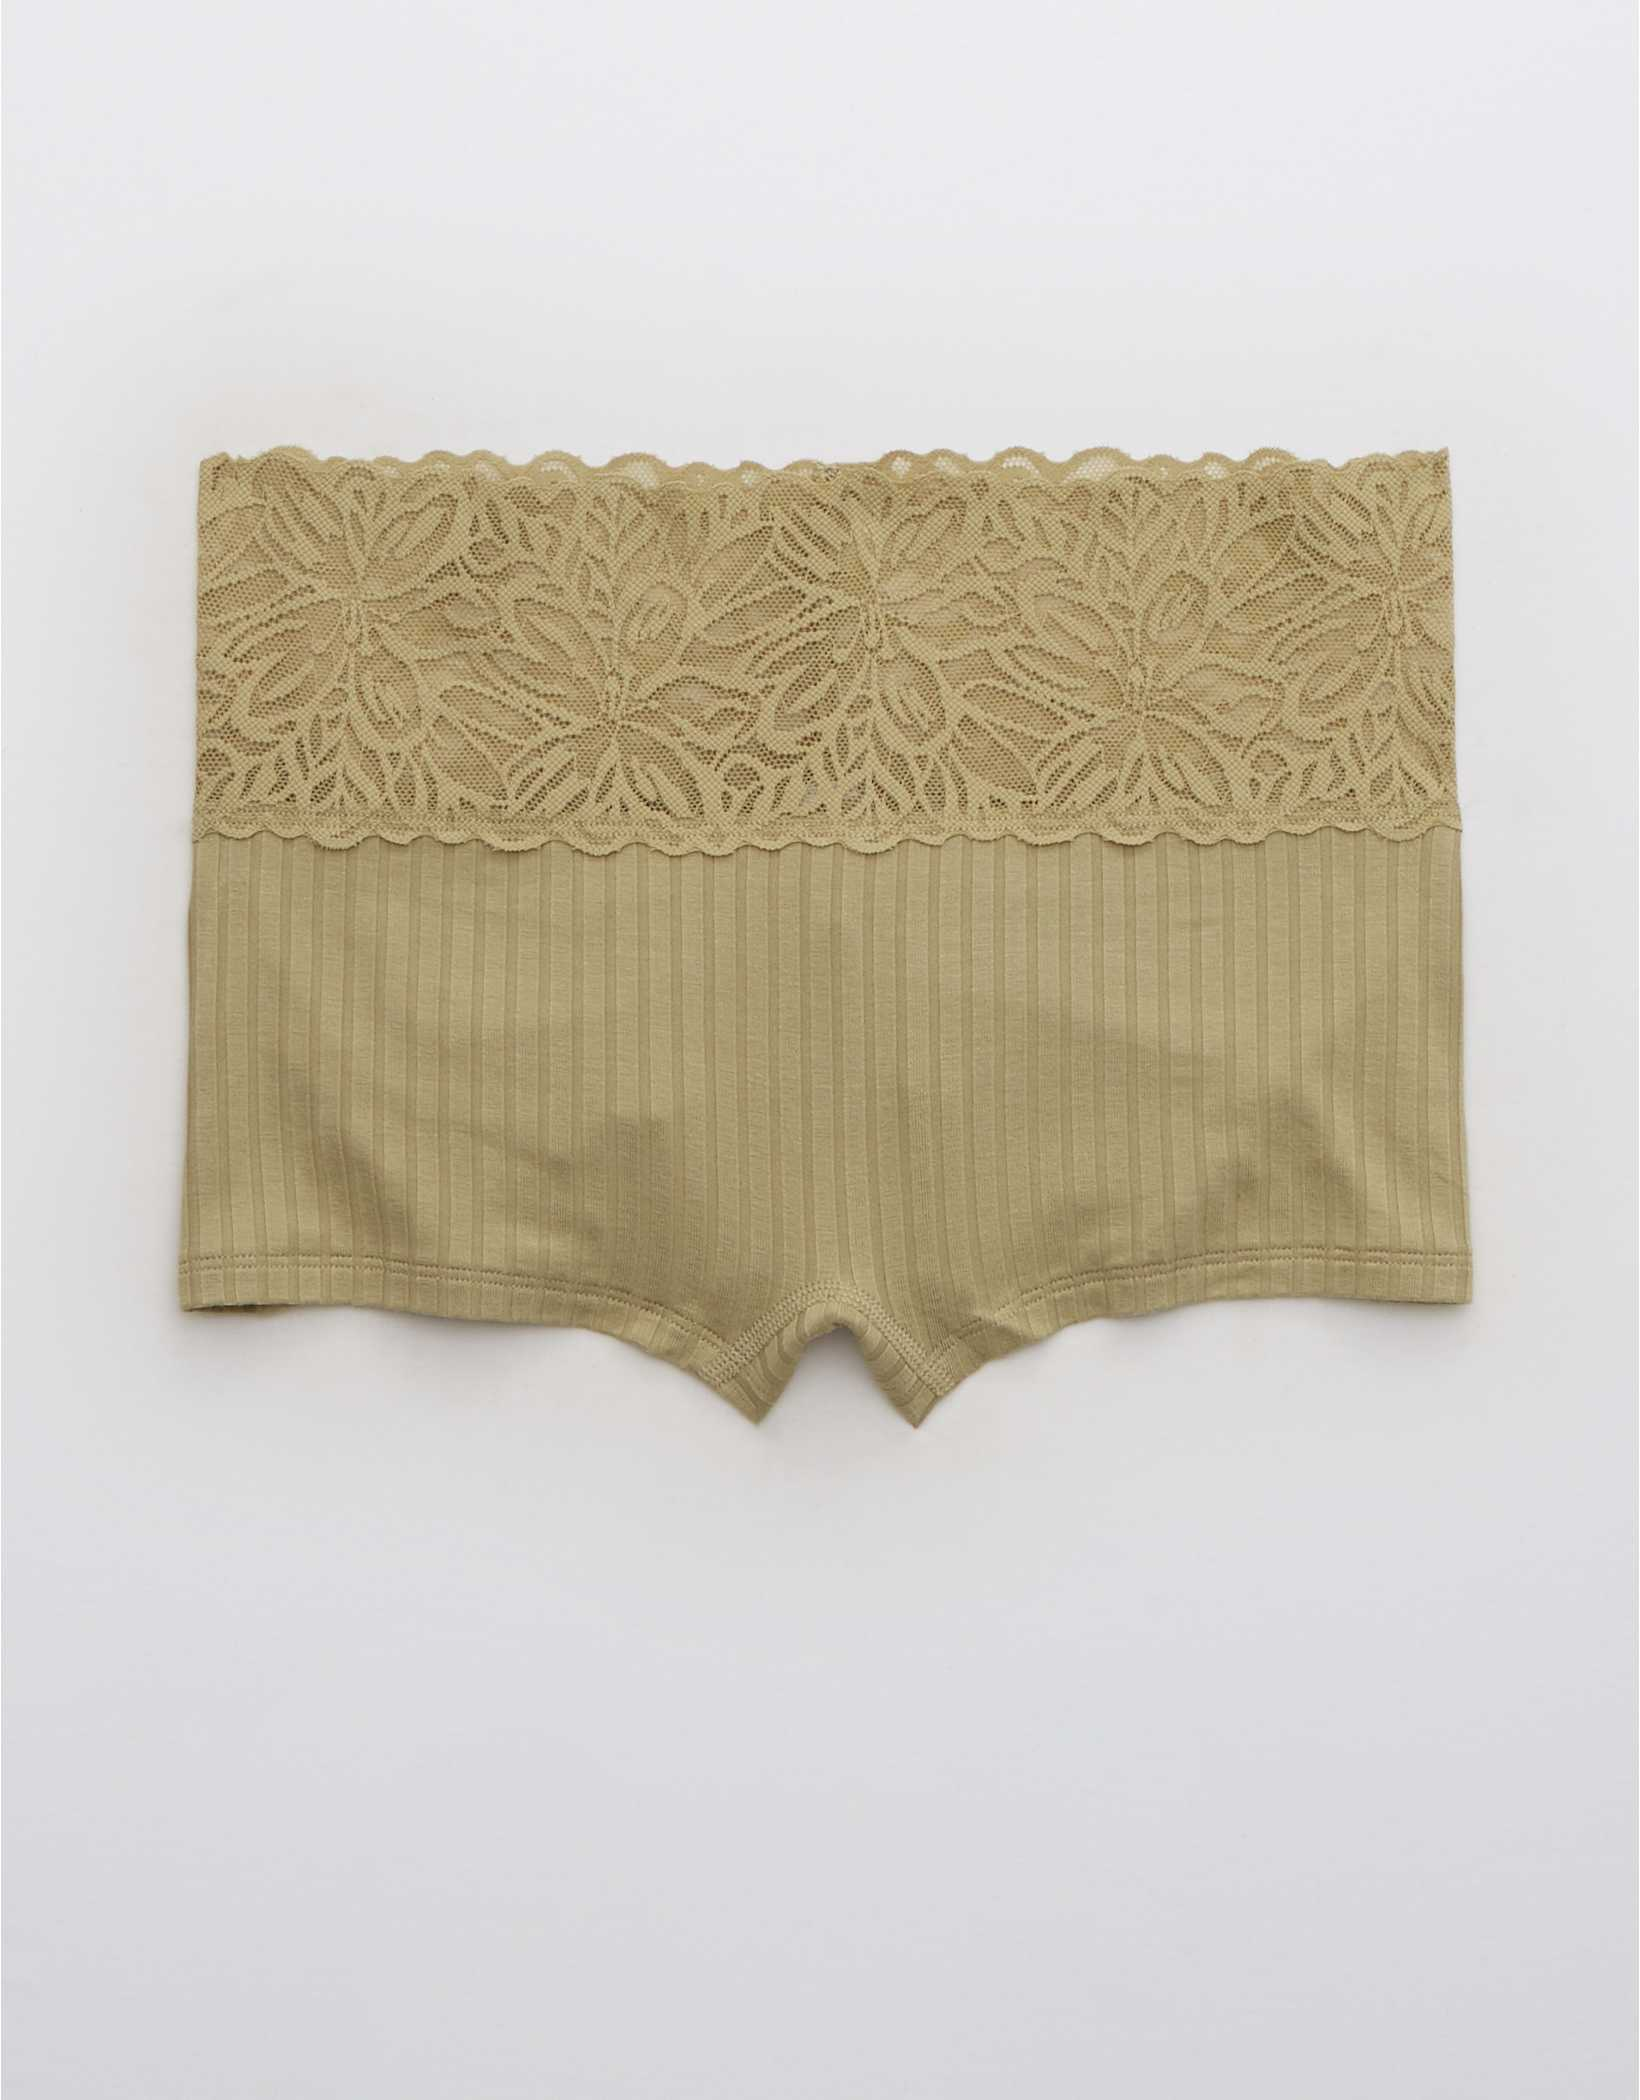 Aerie Ribbed Firework Lace Boyshort Underwear